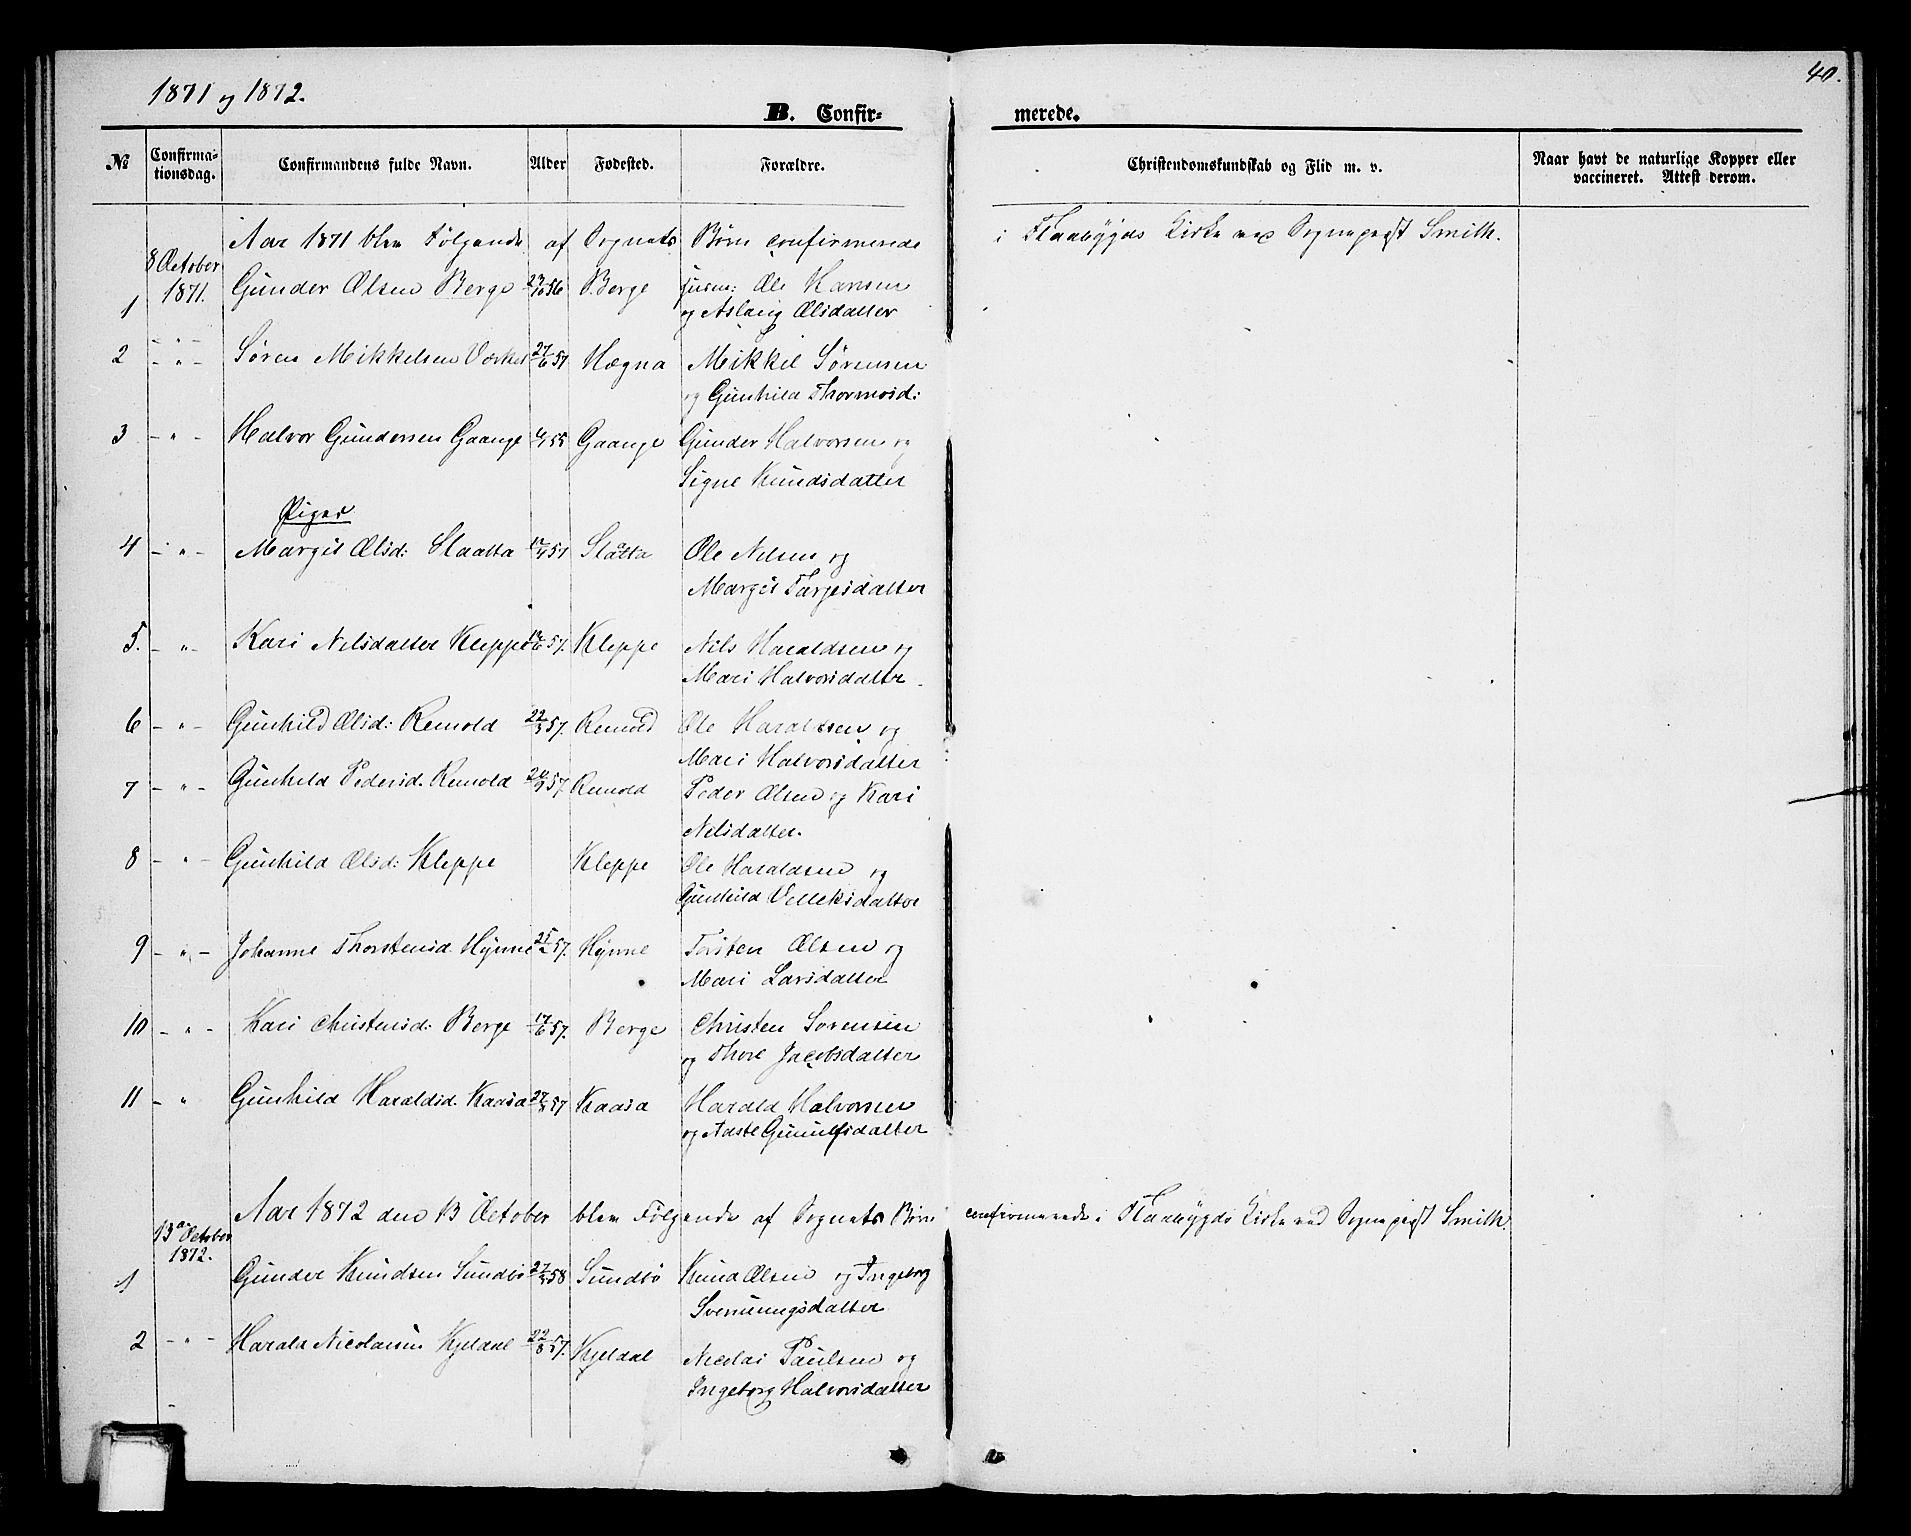 SAKO, Lunde kirkebøker, G/Gb/L0001: Klokkerbok nr. II 1, 1866-1887, s. 40